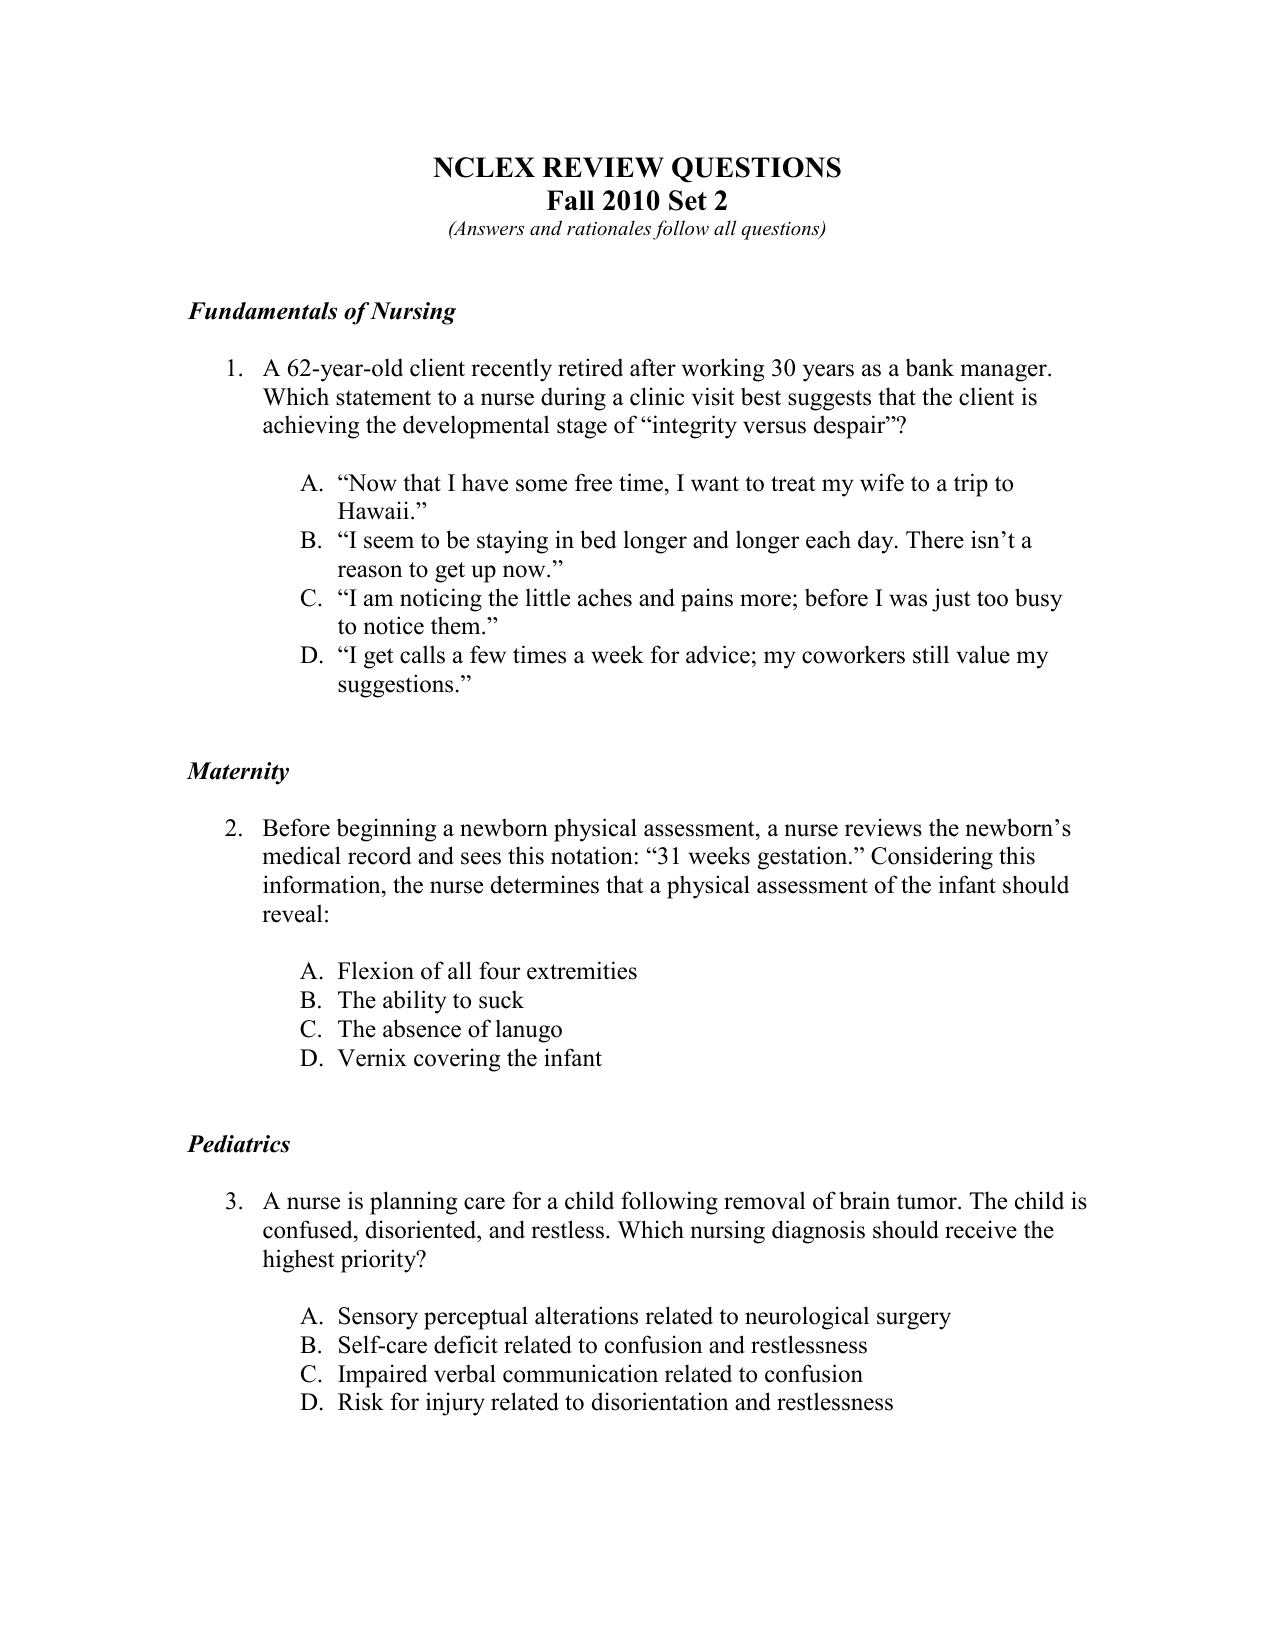 NCLEX QUESTIONS #4